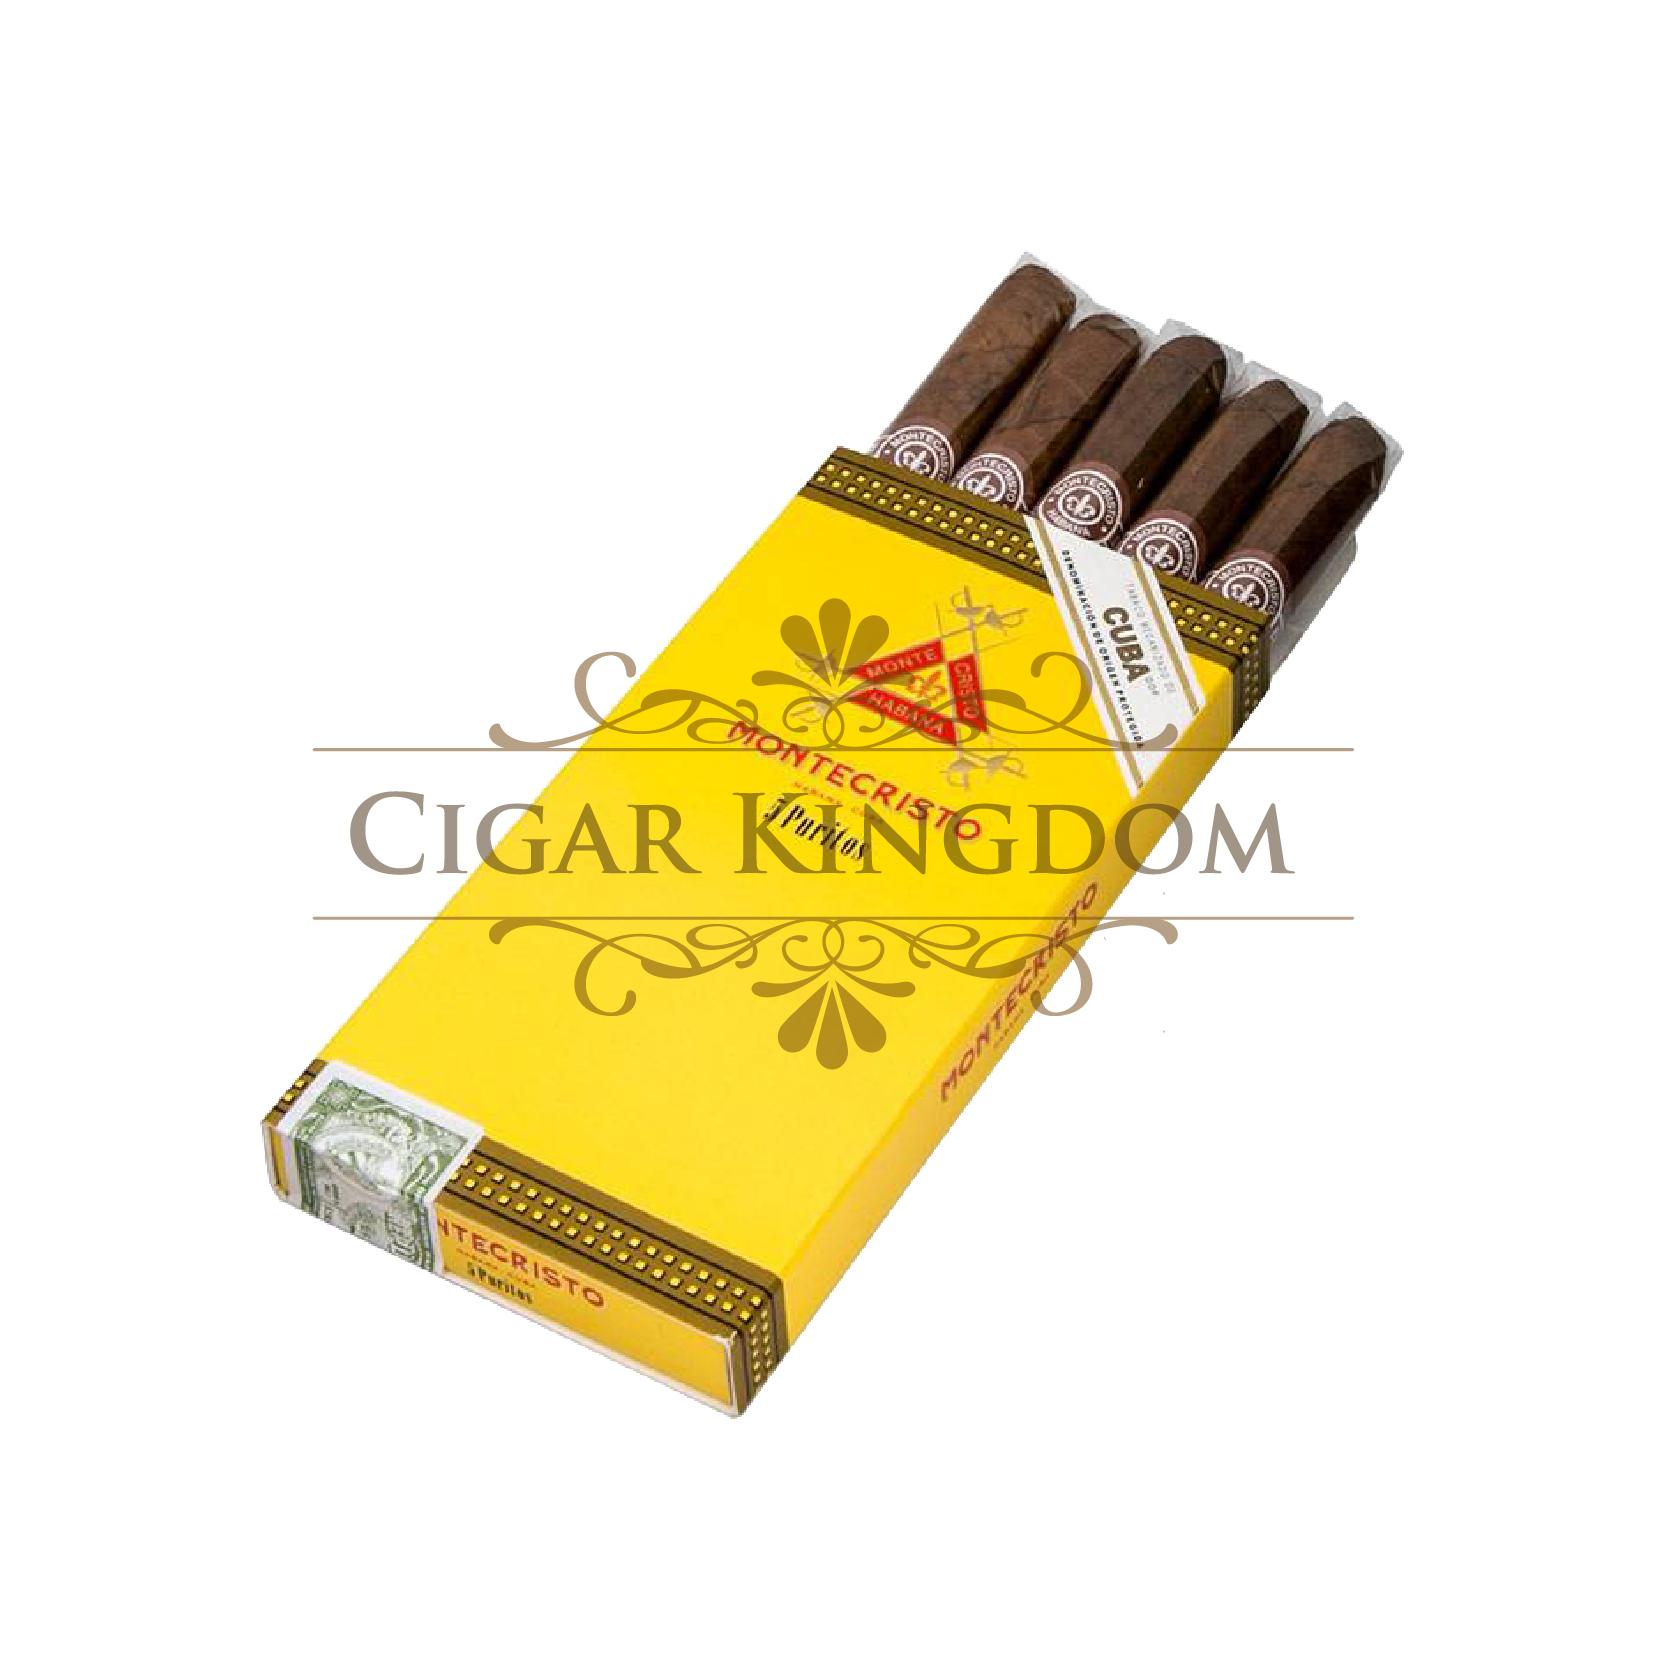 Montecristo - Puritos (Pack of 5s)